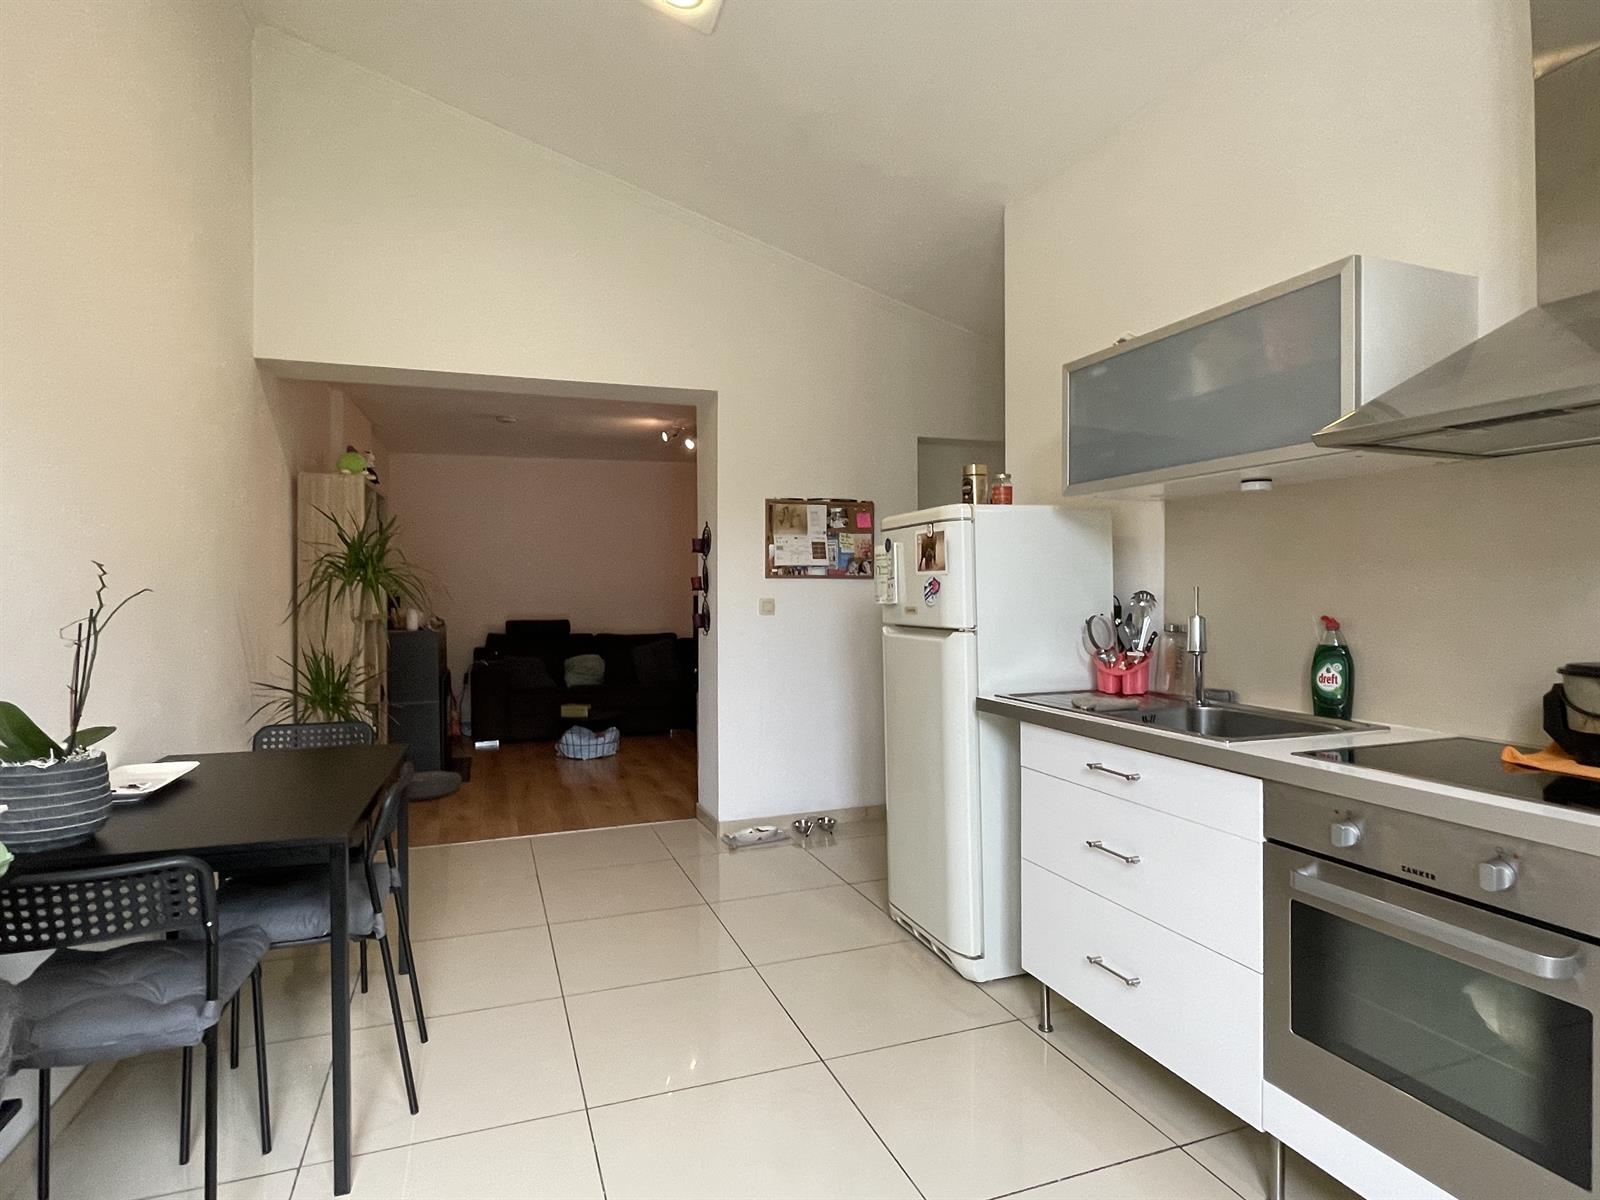 Appartement avec jardin - Pepinster Wegnez - #4330519-1